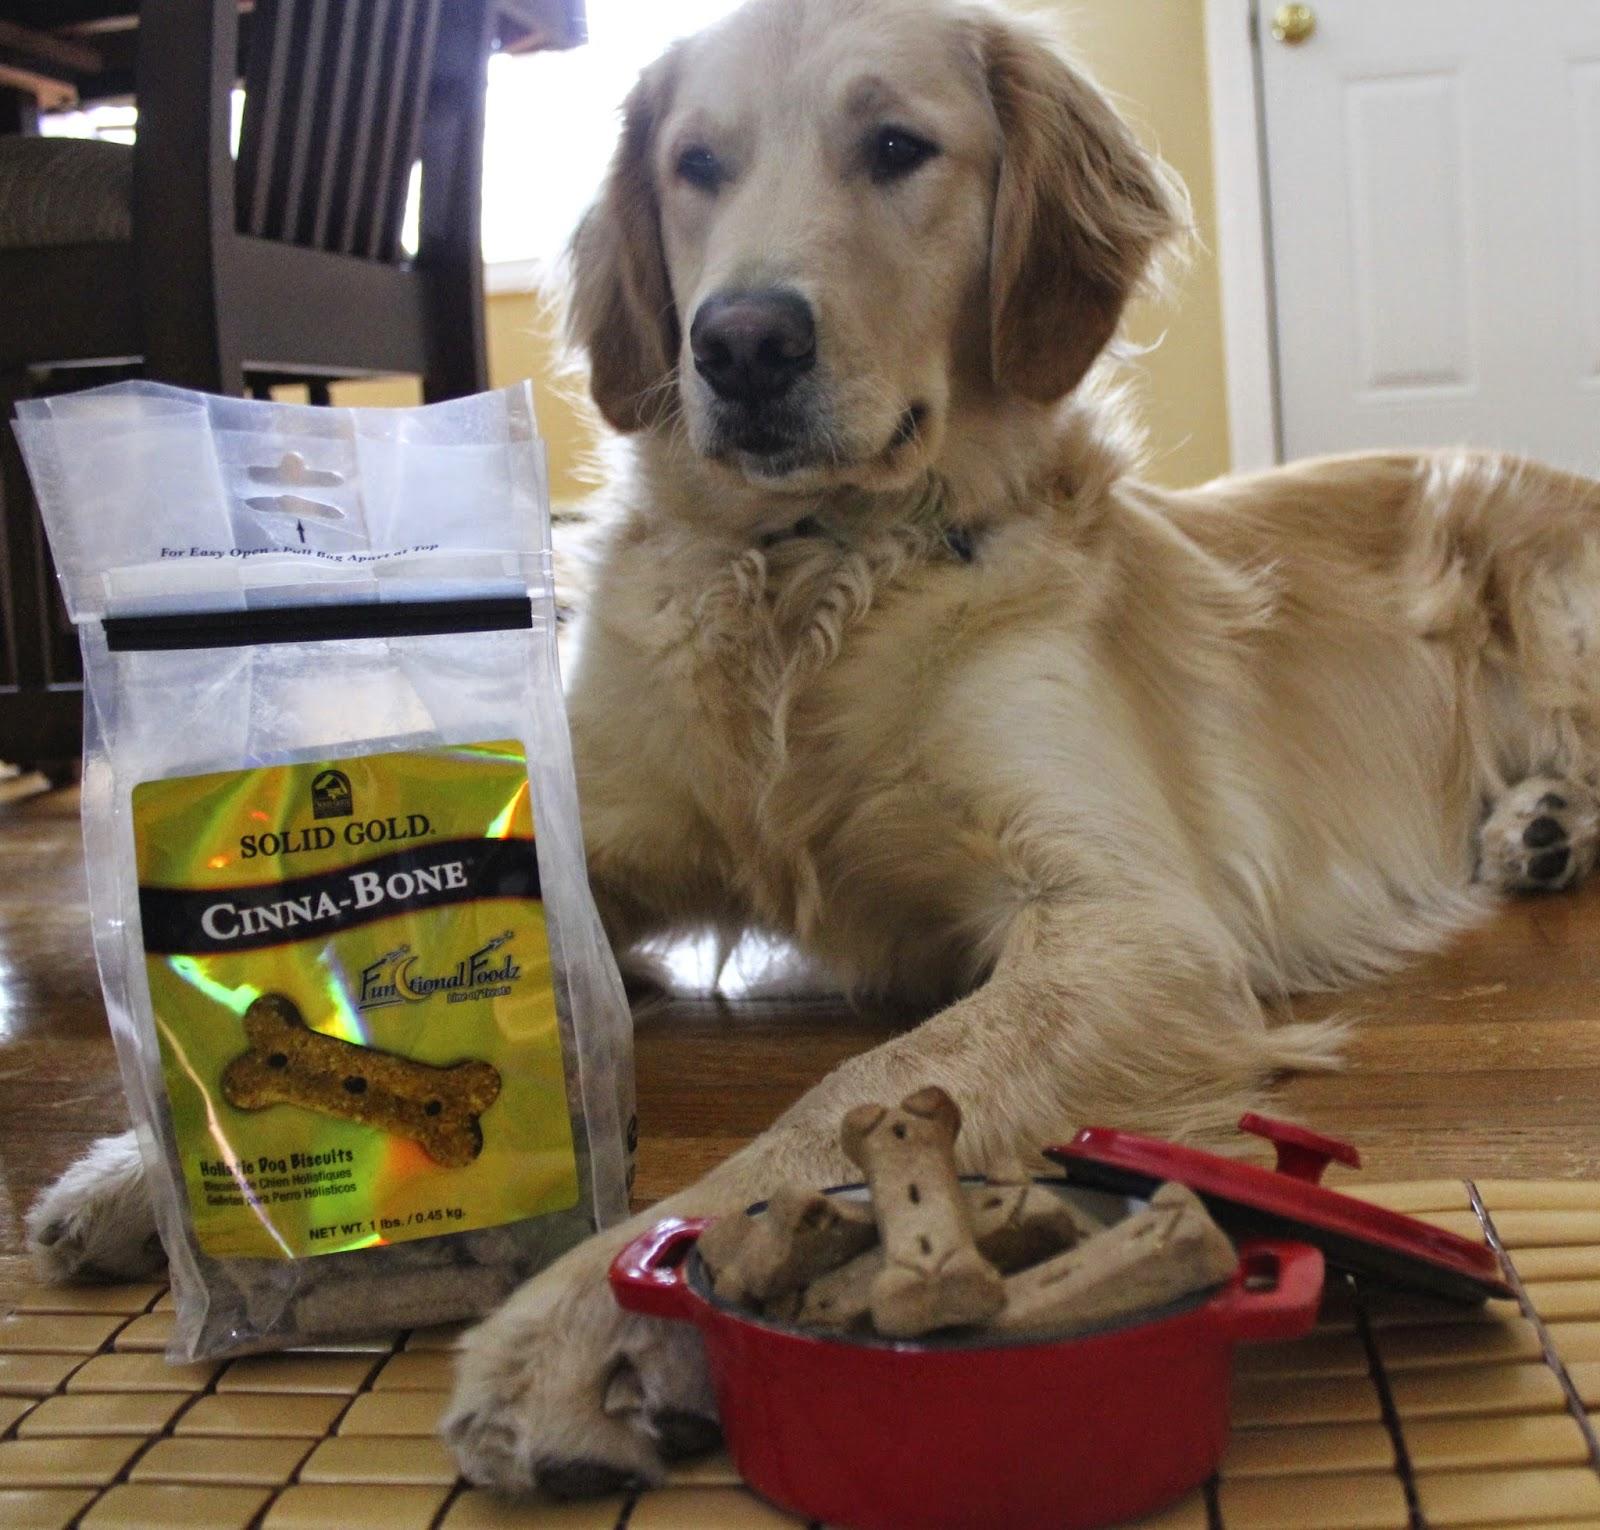 dog and Cinna-Bone dog biscuits